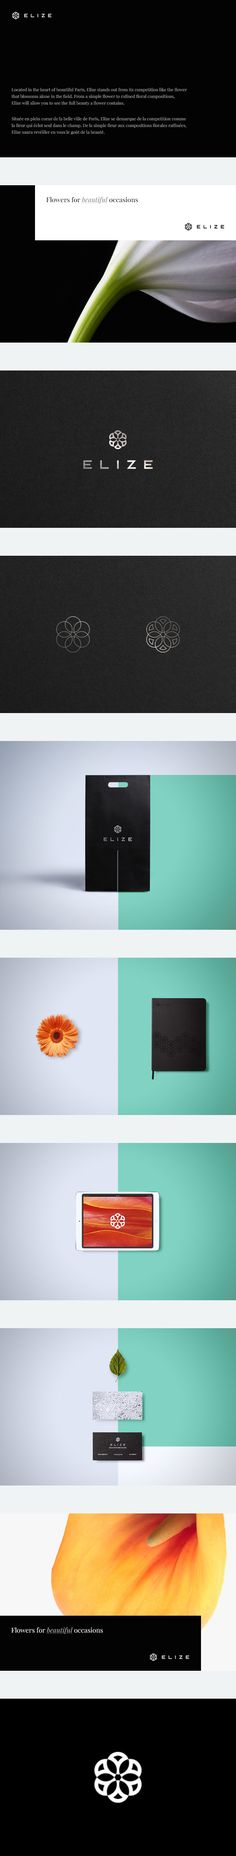 "@Behance portfolio: ""ELIZE"" https://www.behance.net/gallery/21725201/ELIZE by Cris Labno"